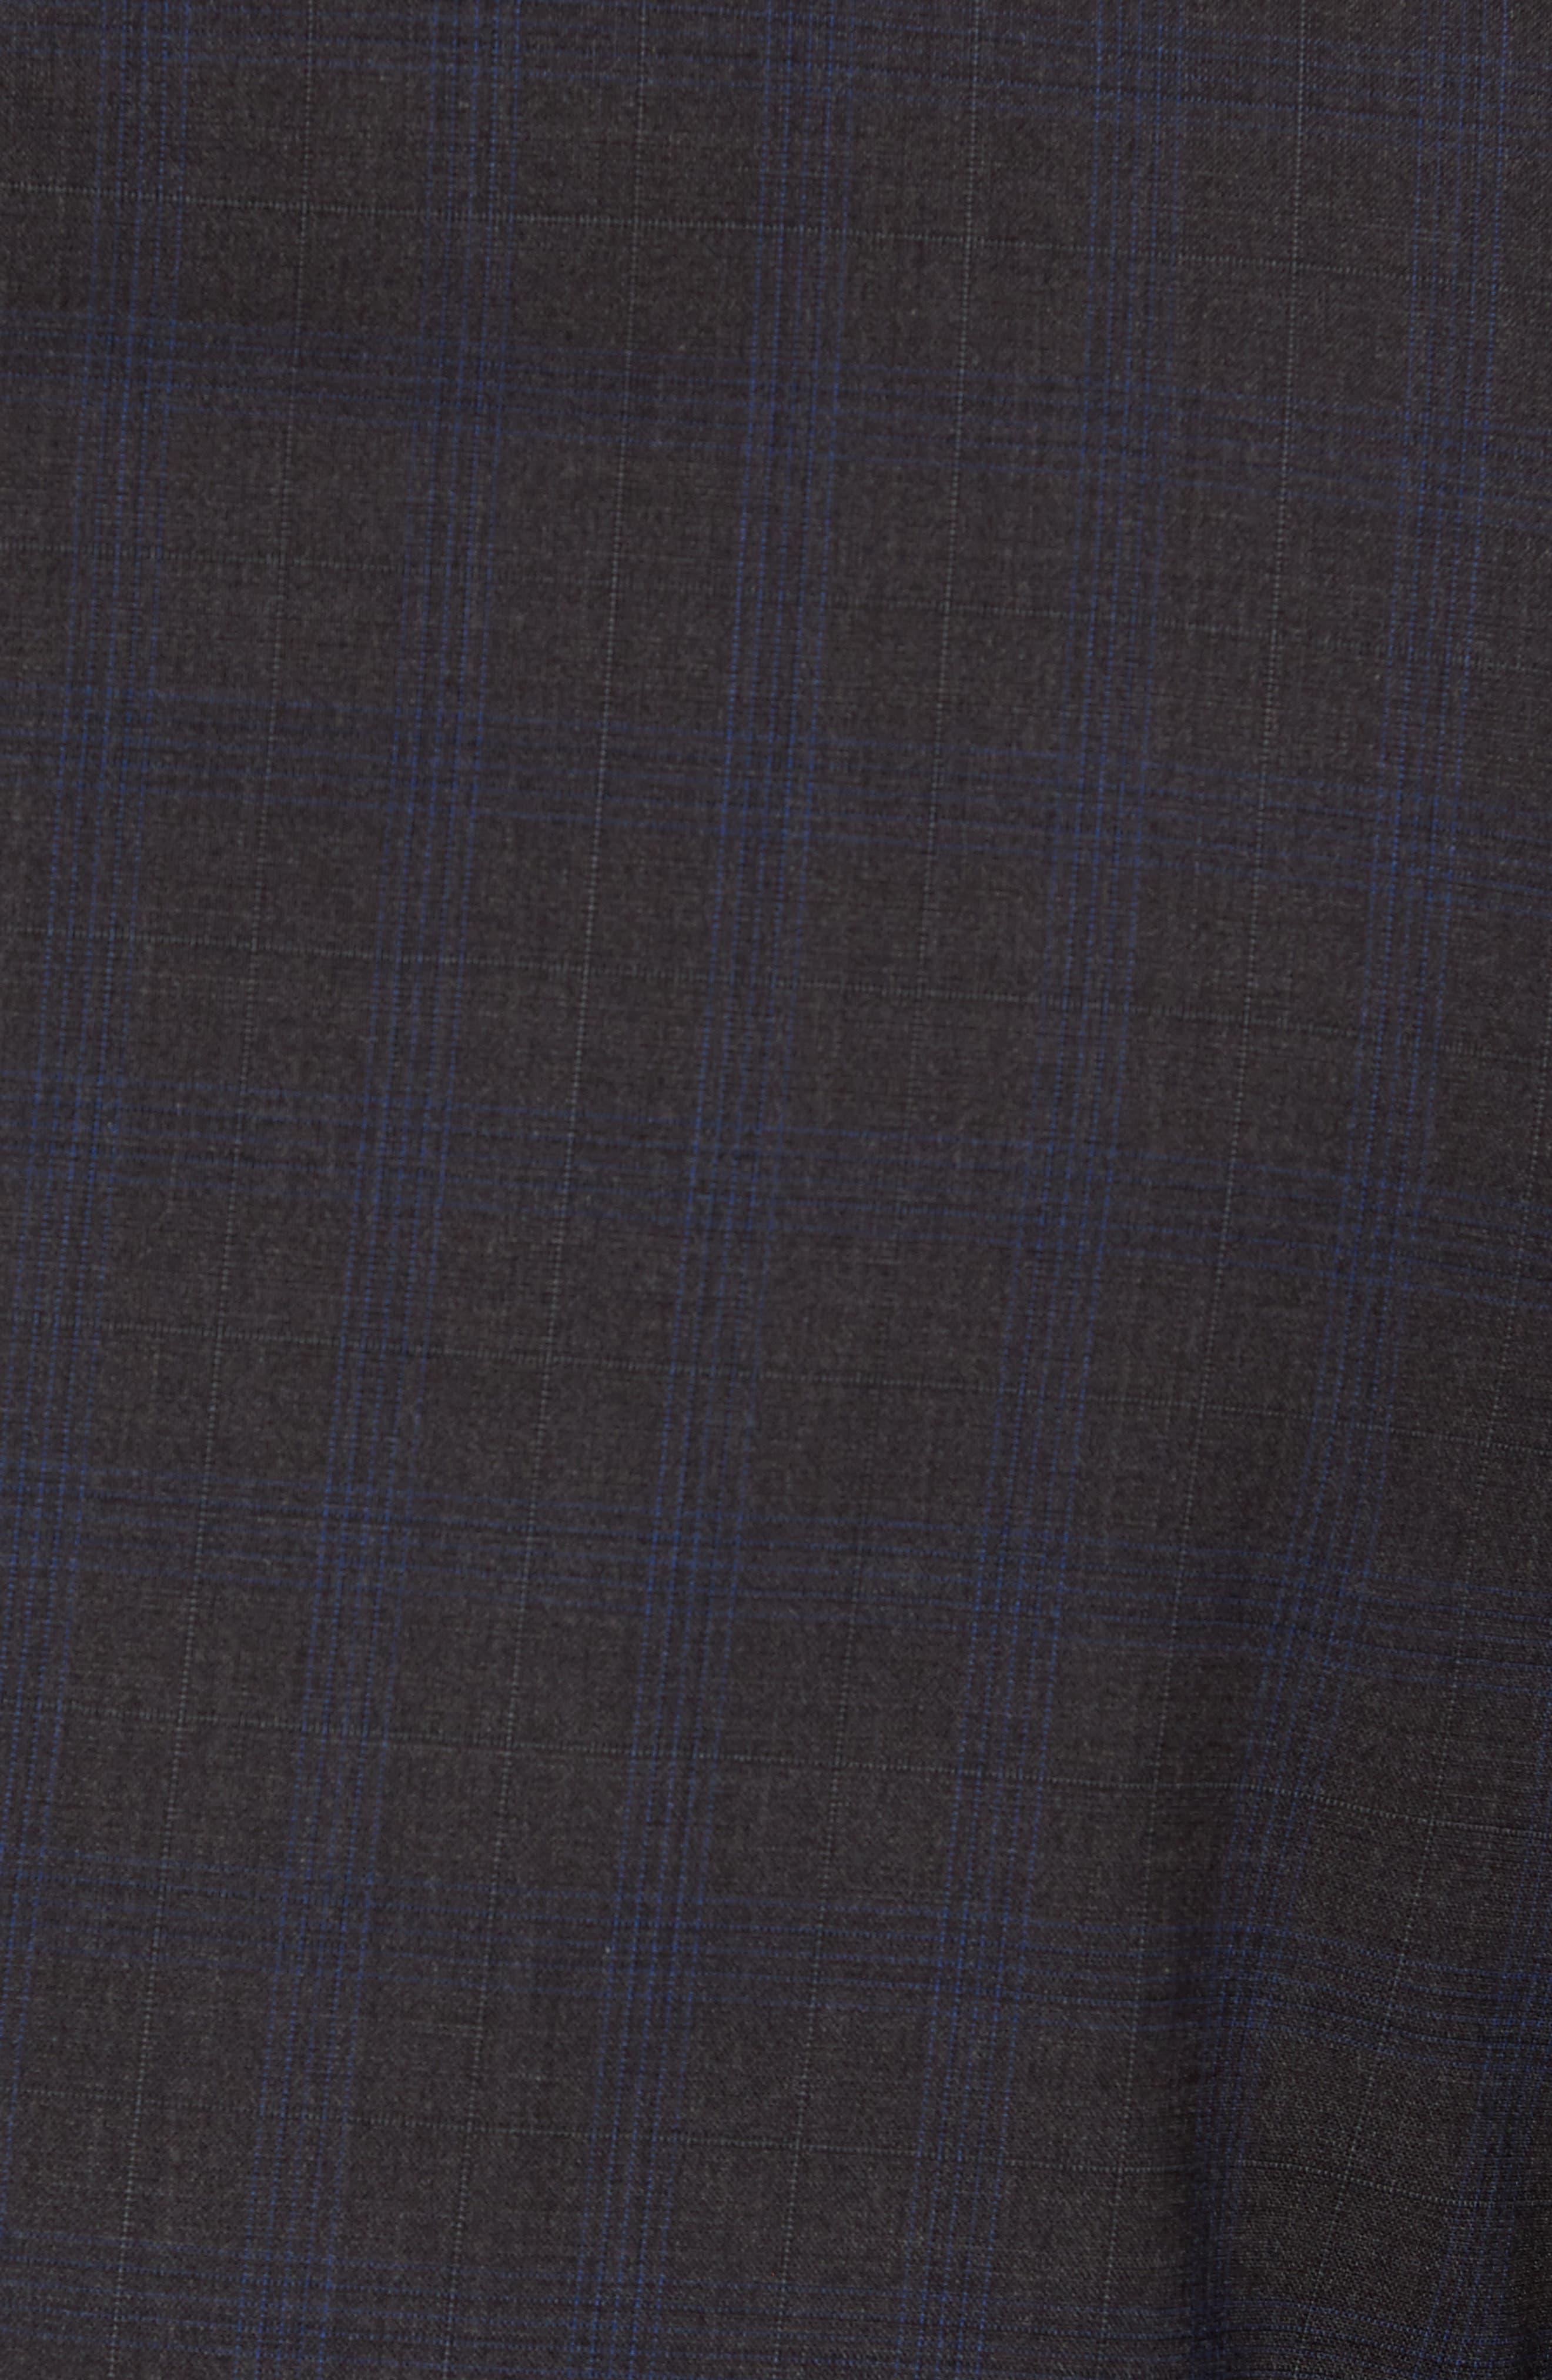 Wellar Grey Blue Plaid Sport Coat,                             Alternate thumbnail 6, color,                             043